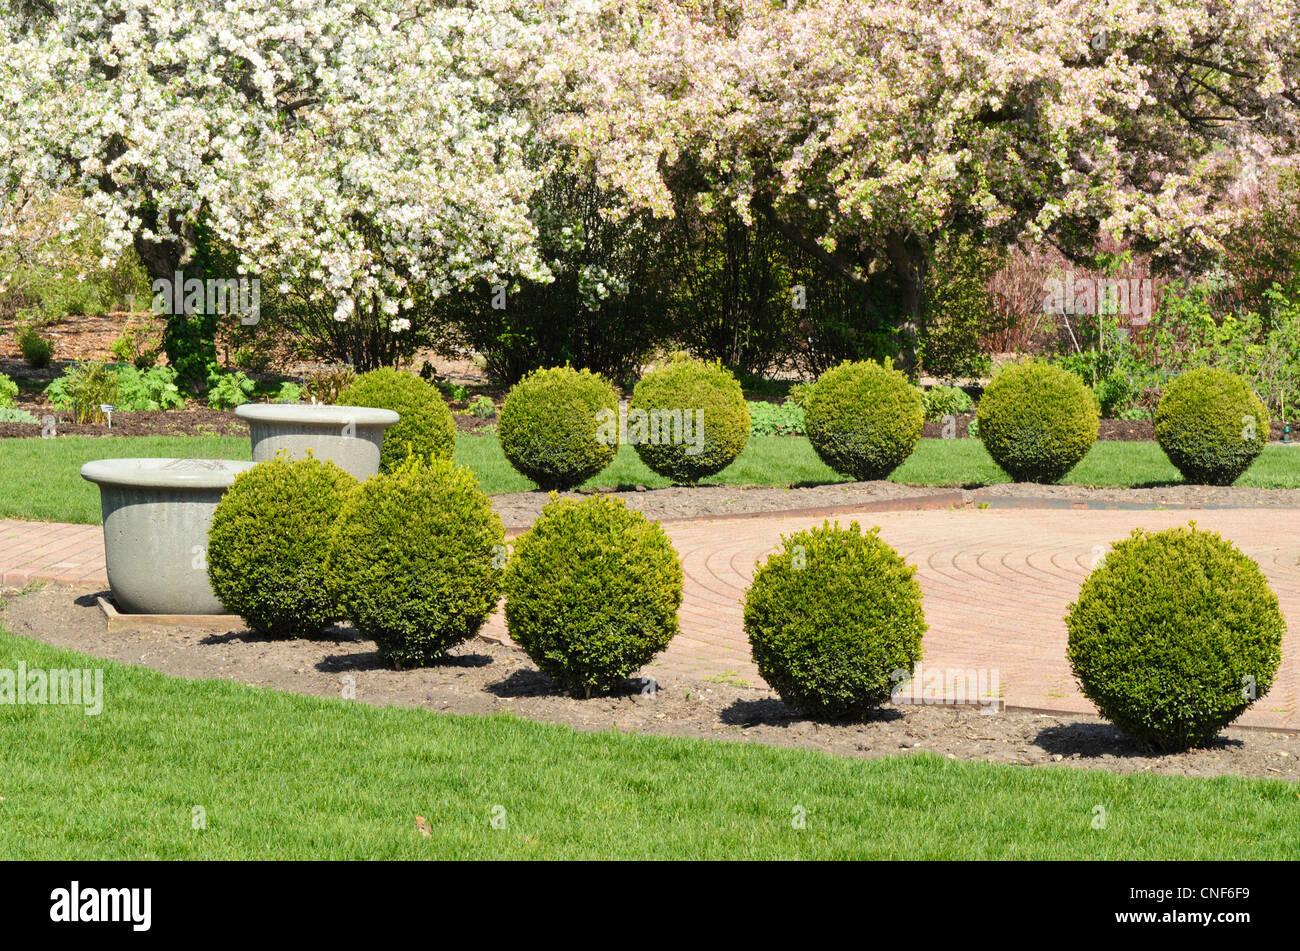 Arc of circular shrubs in botanical garden - Stock Image